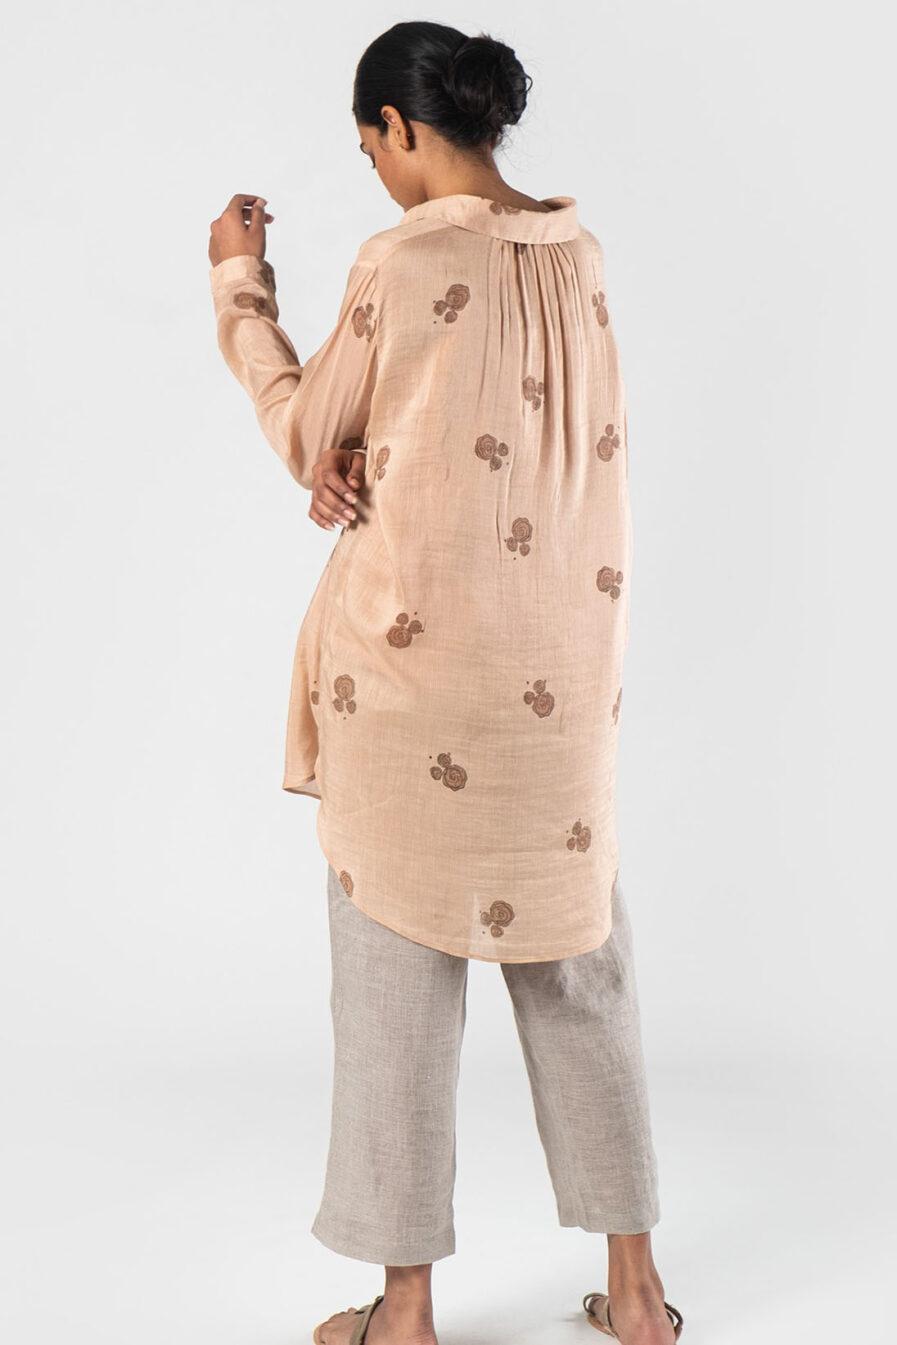 Anavila Peach Brooke shirt (Printed S-L)